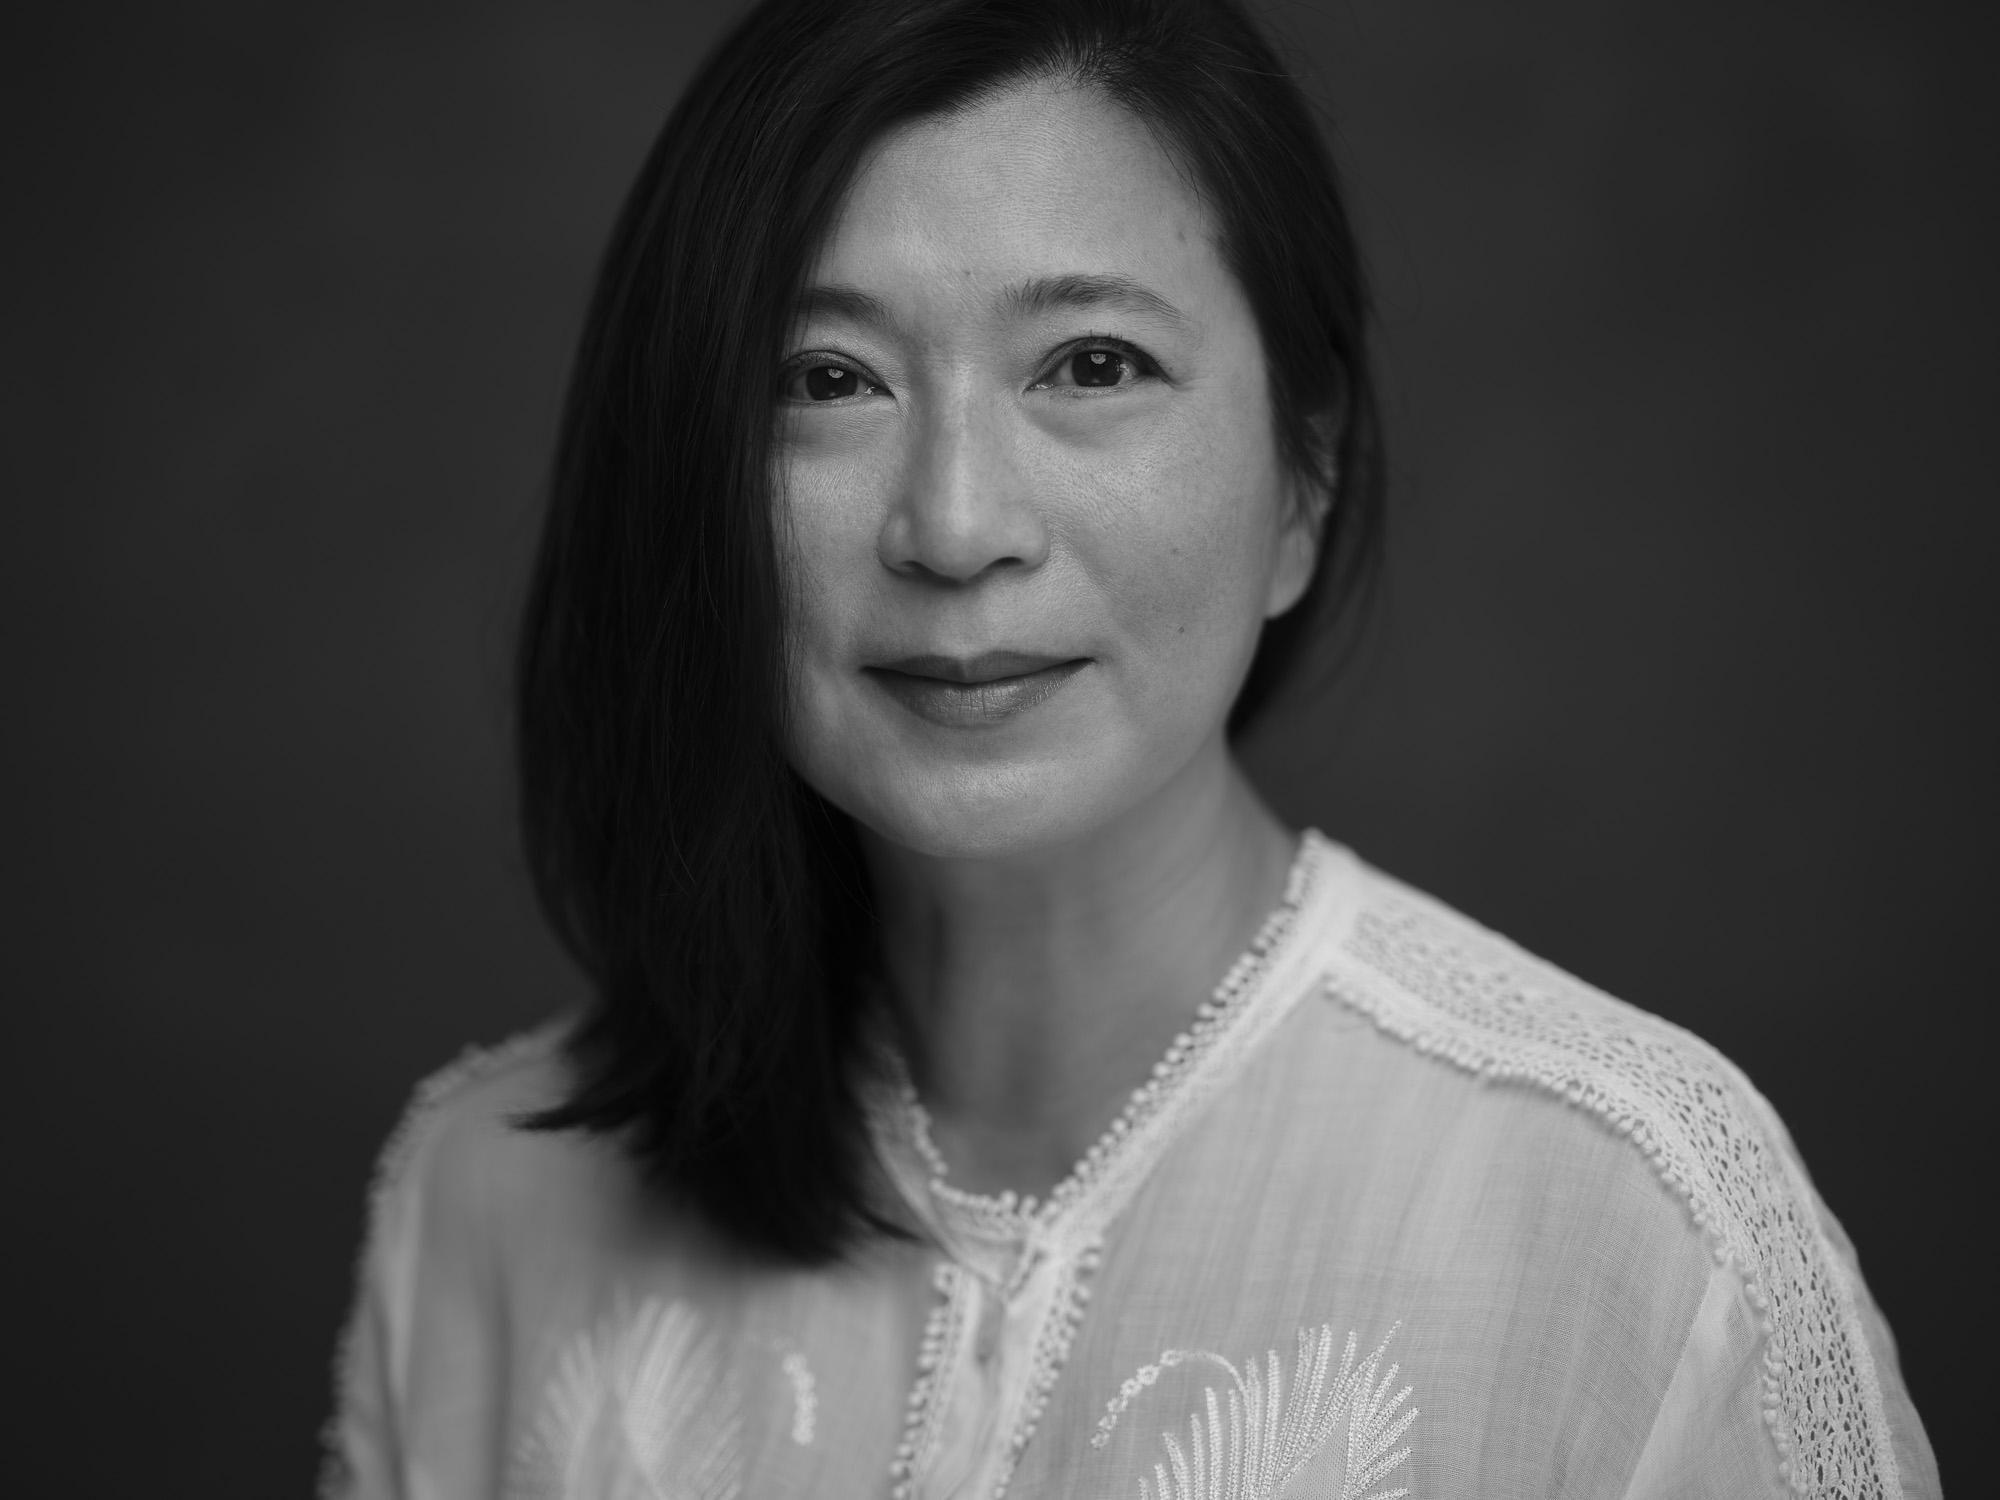 Black and White Portrait Photography Headshot Photographer Singapore COCO Creative Studio 2